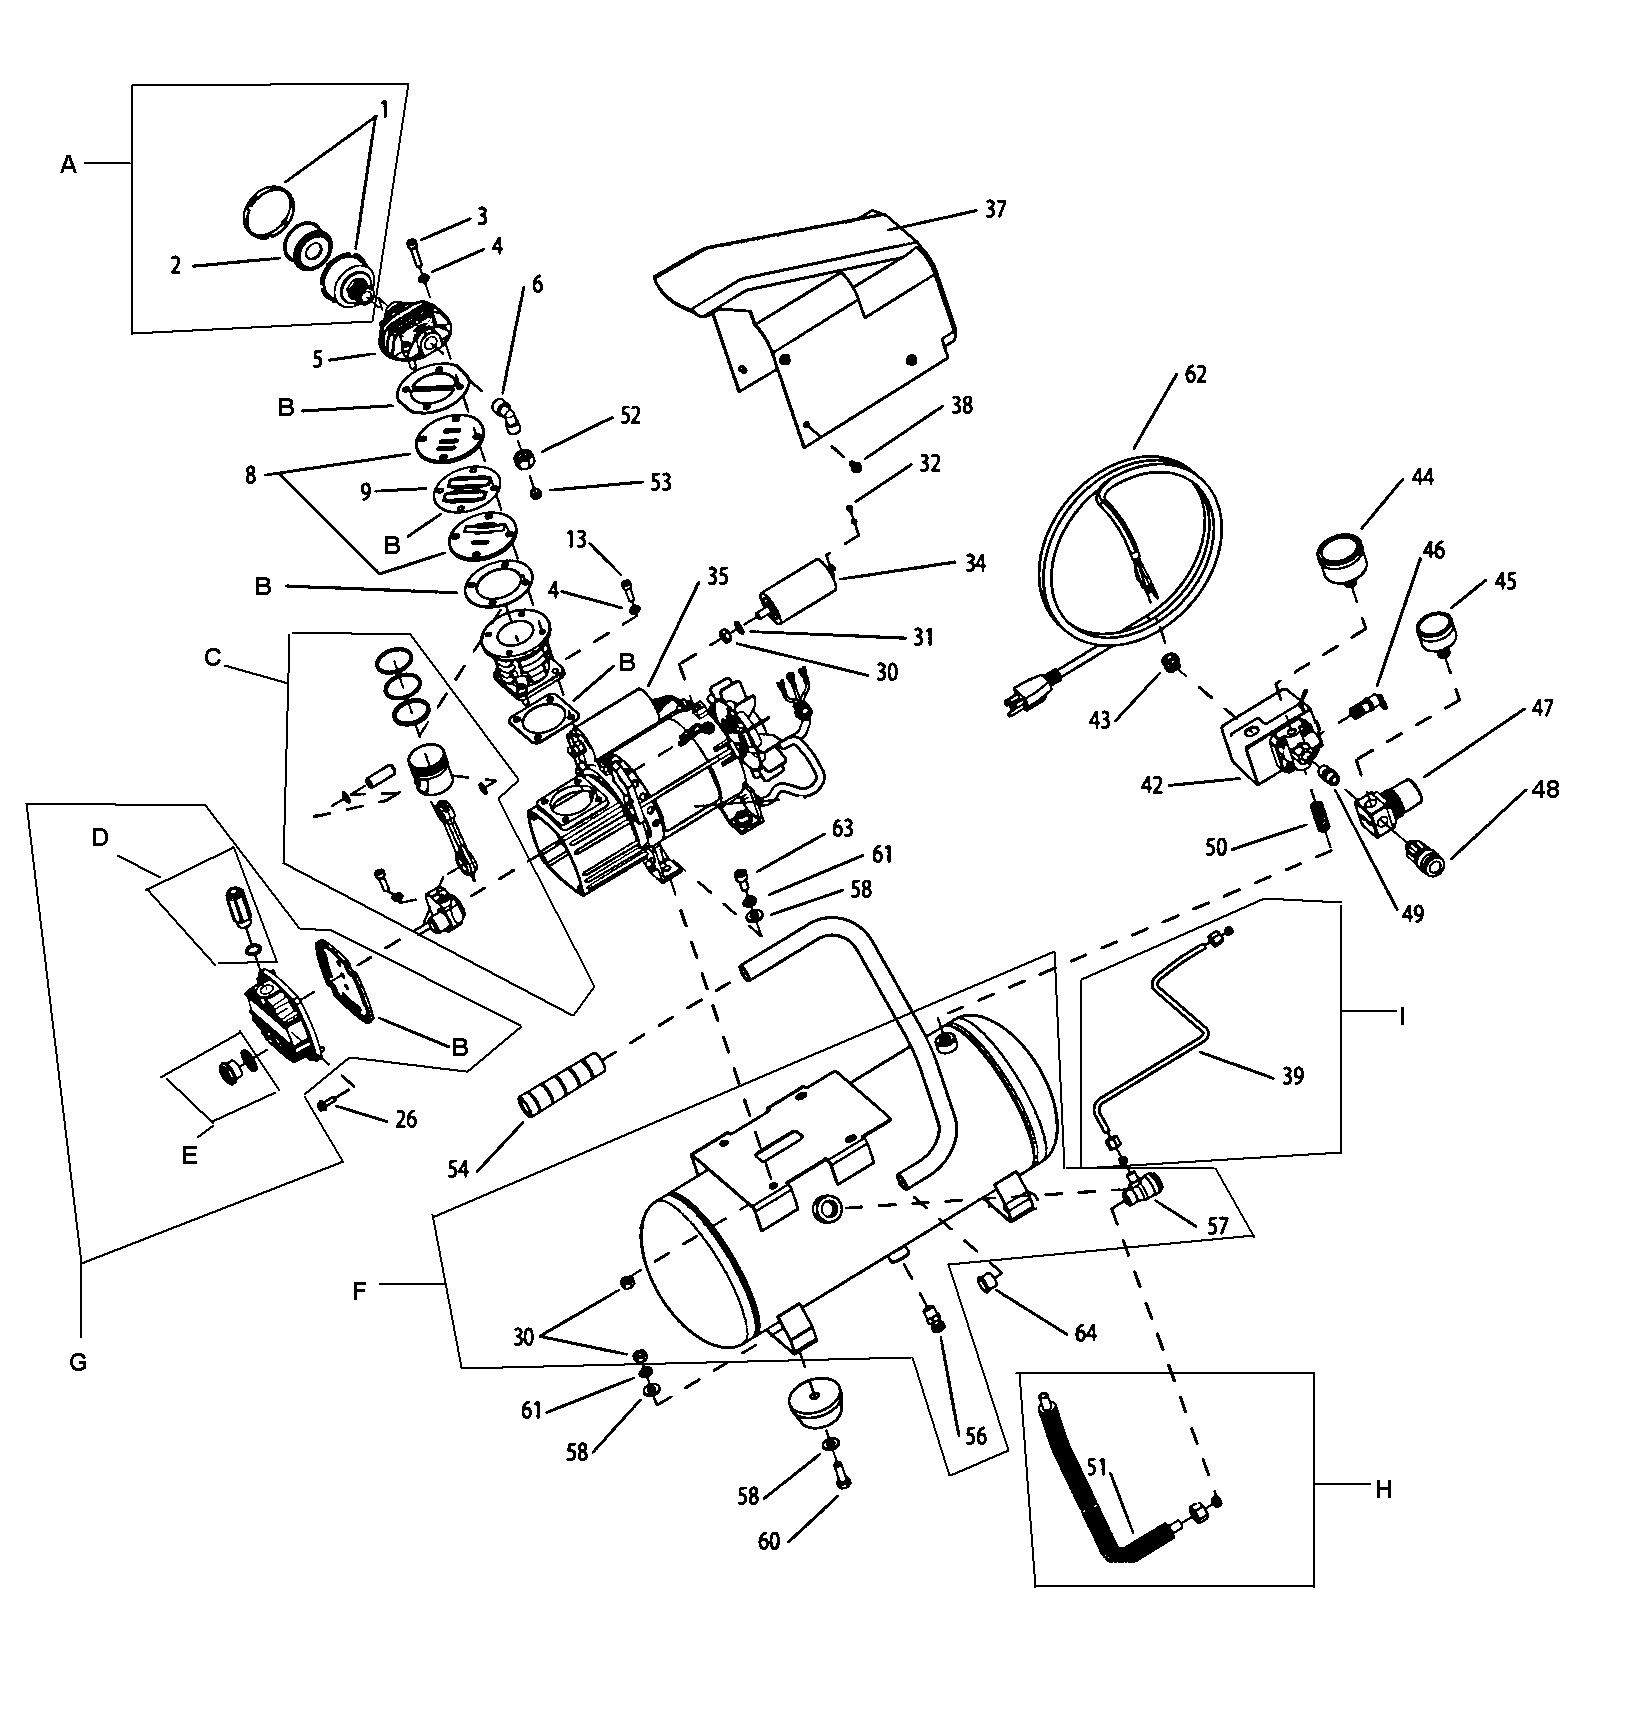 Craftsman model 921153101 air compressor genuine parts